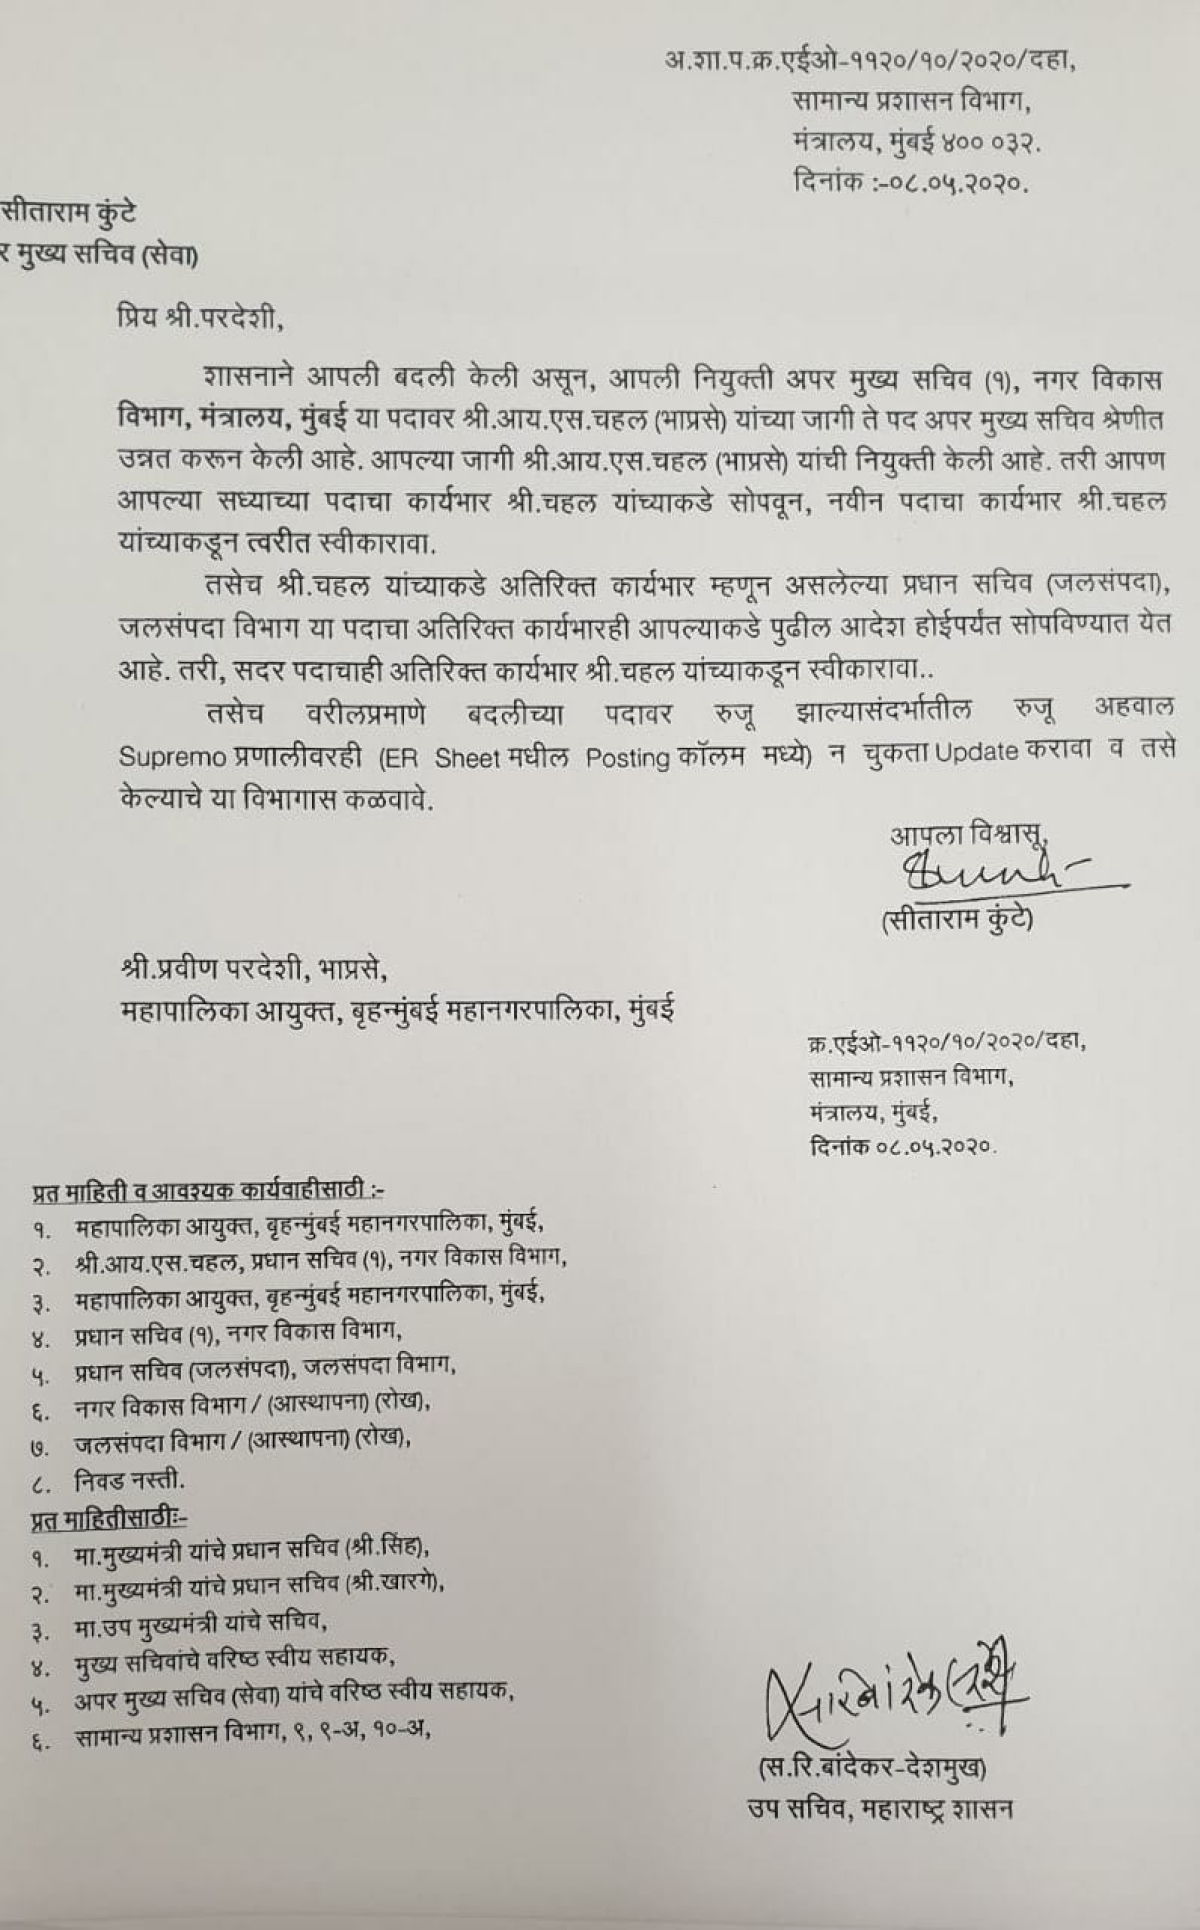 Major shake-up at BMC, Iqbal Chahal made new commissioner, Ashwini Bhide returns